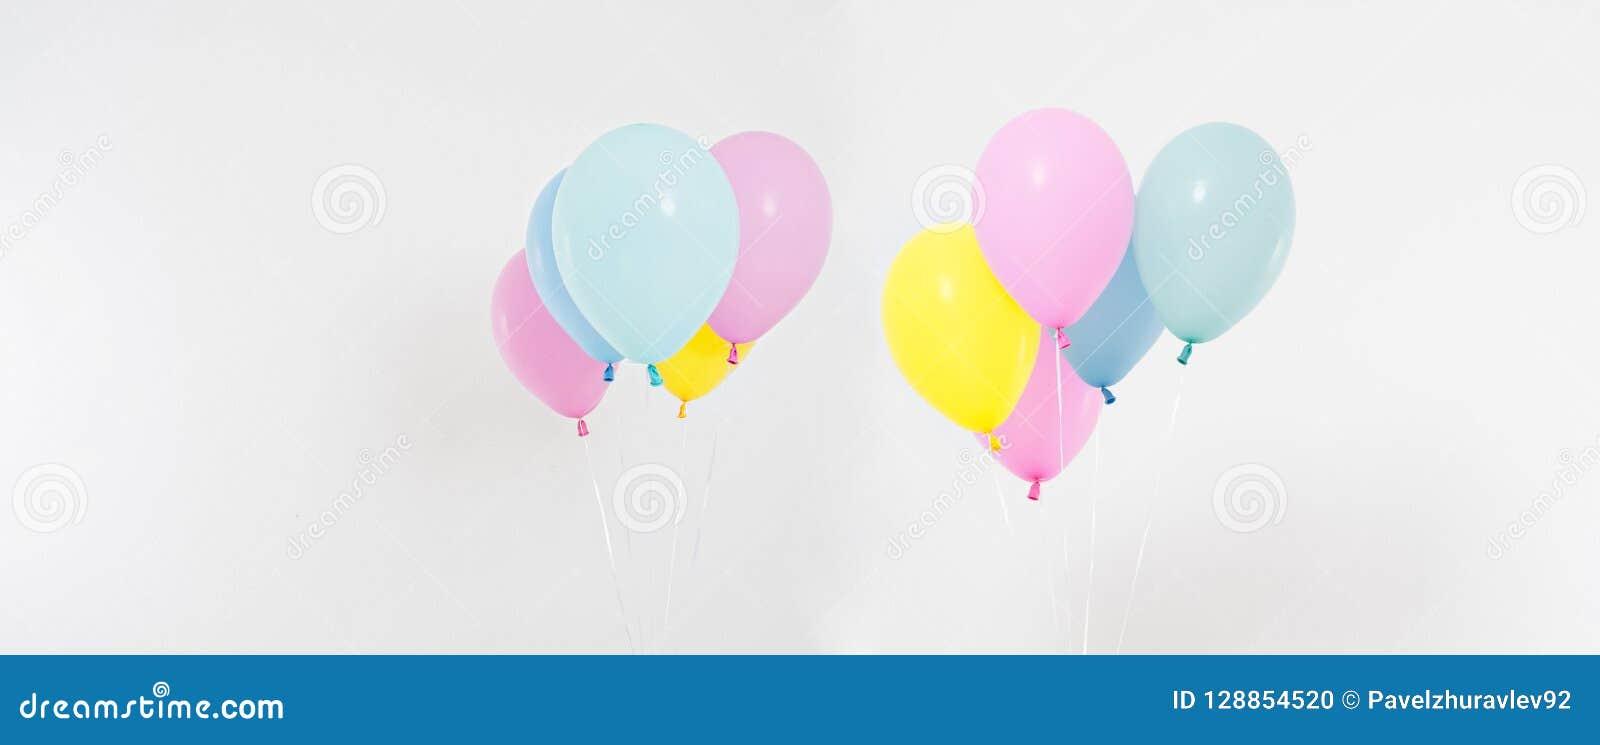 Set,collage coloured balloons background. Celebration, holidays, summer concept. Design template, billboard or banner blank